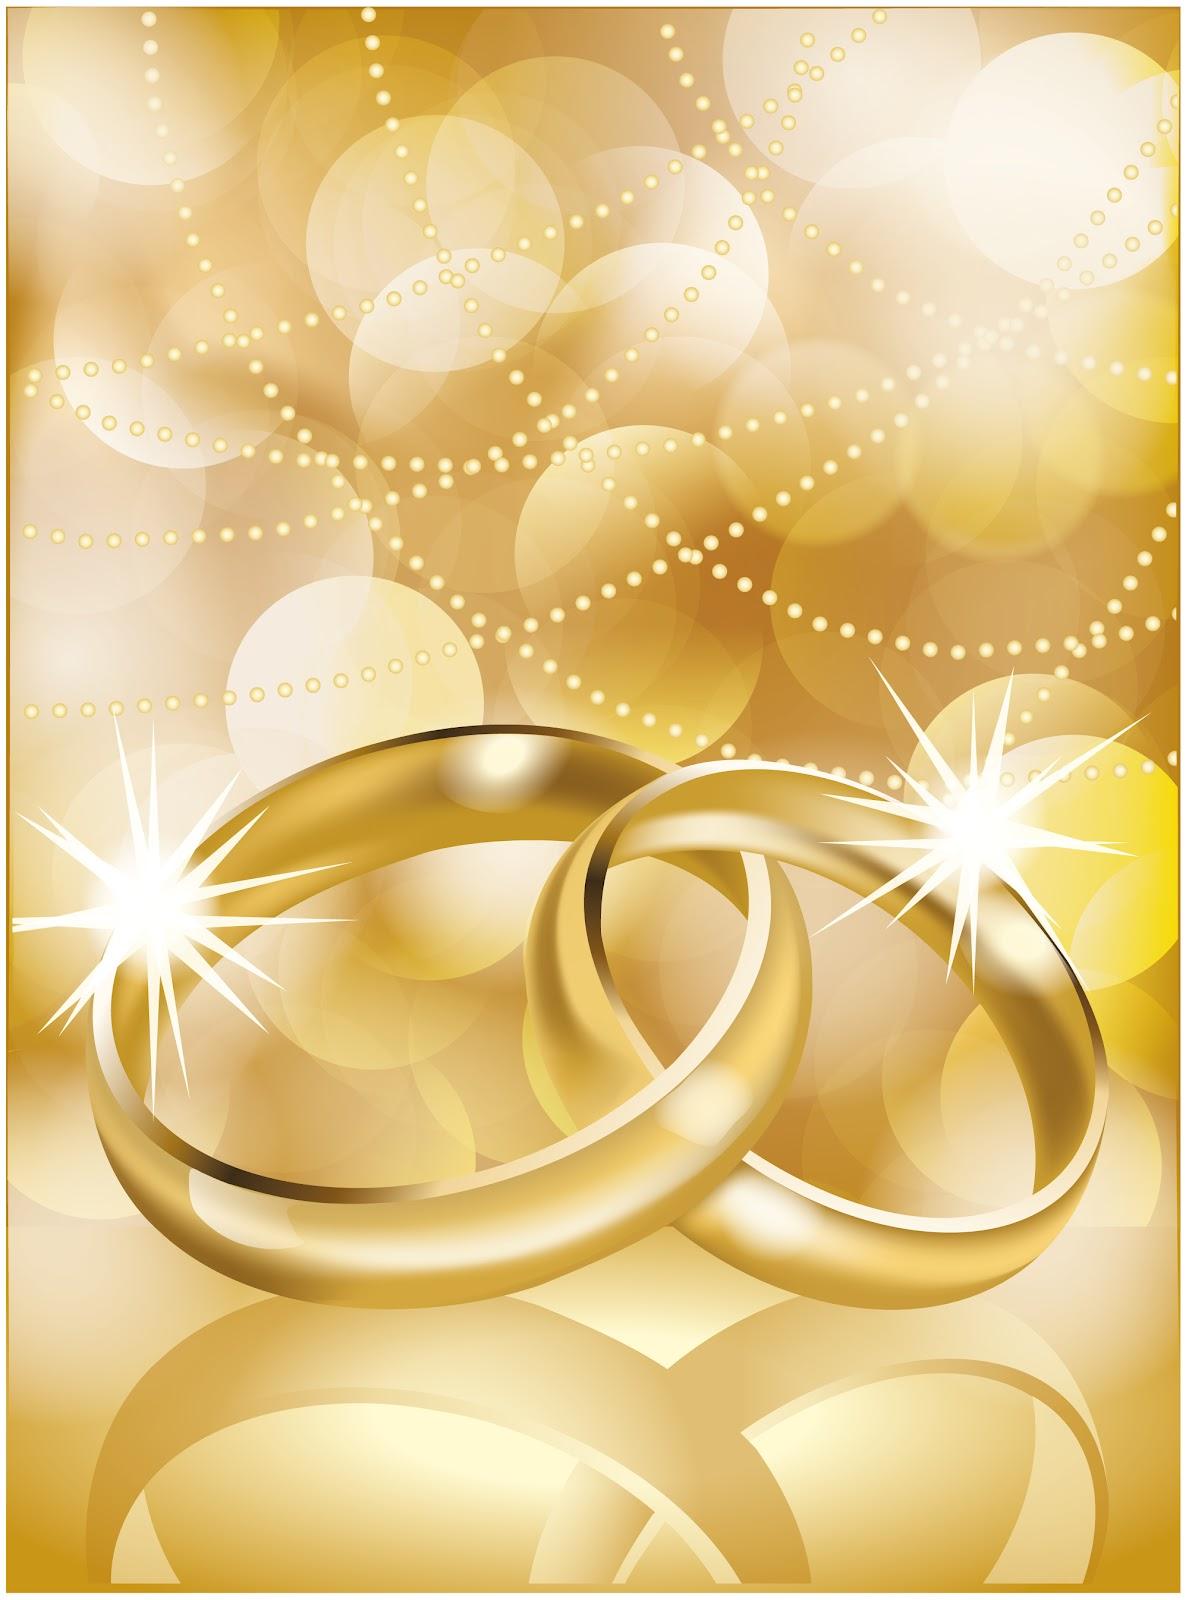 Matrimonio Para Imprimir Alianzas Doradas Anillos De Matrimonio Para